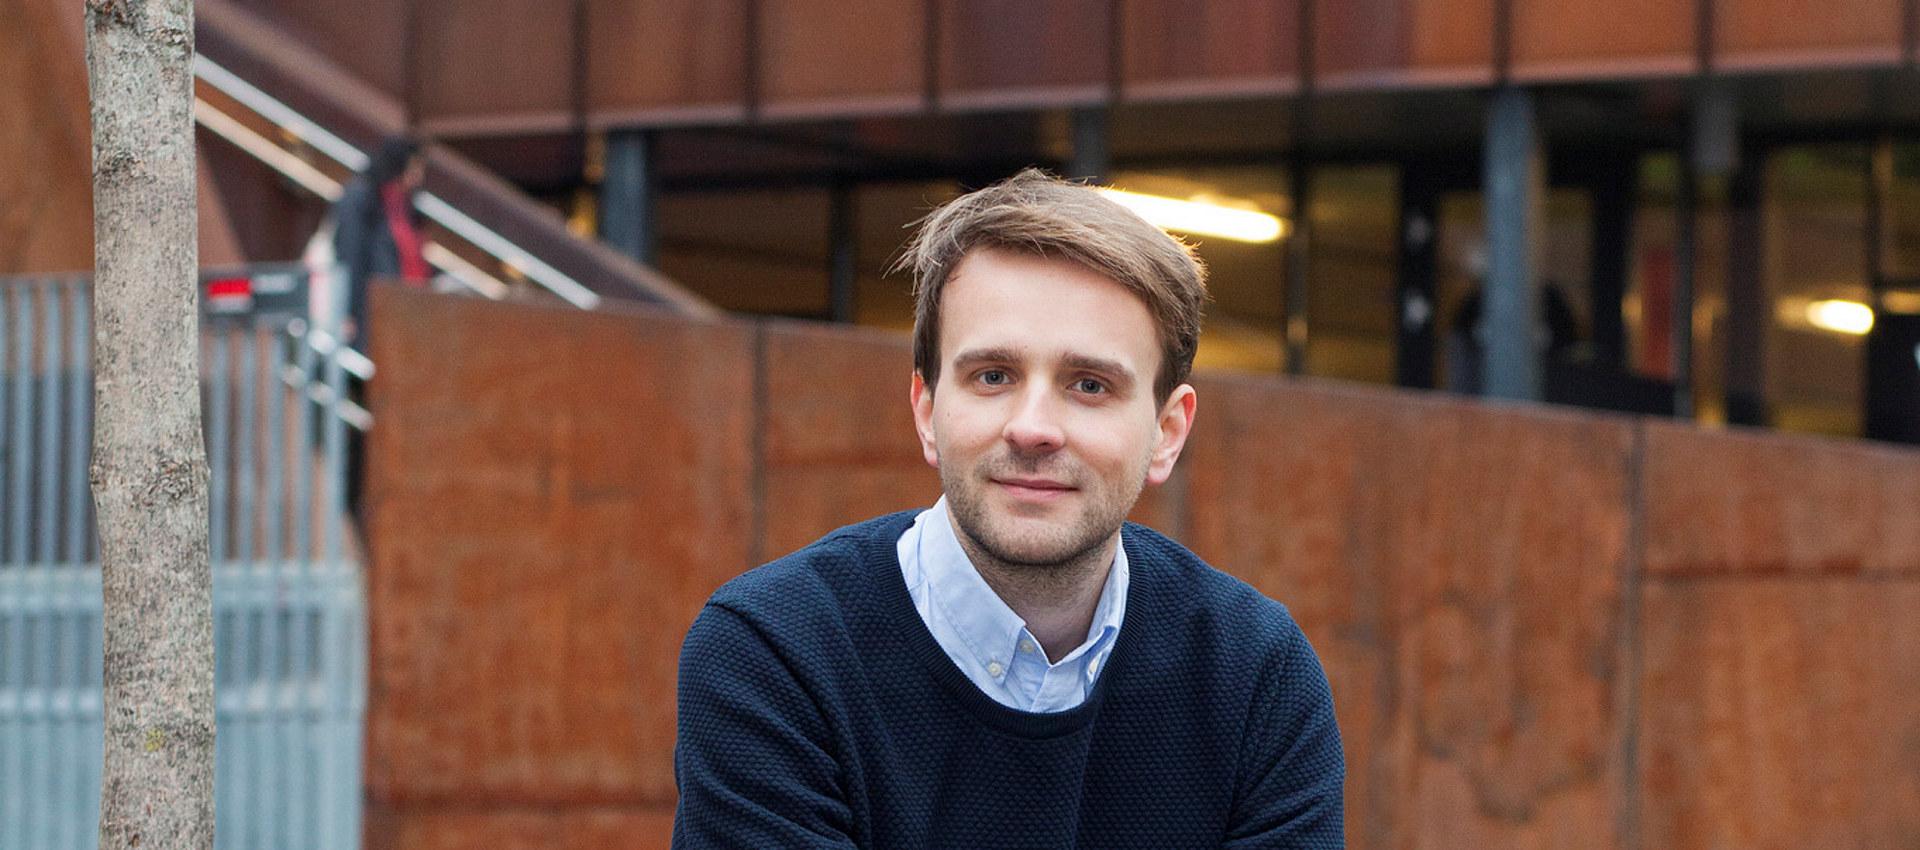 Jan Christian Vestre, CEO, Vestre AS